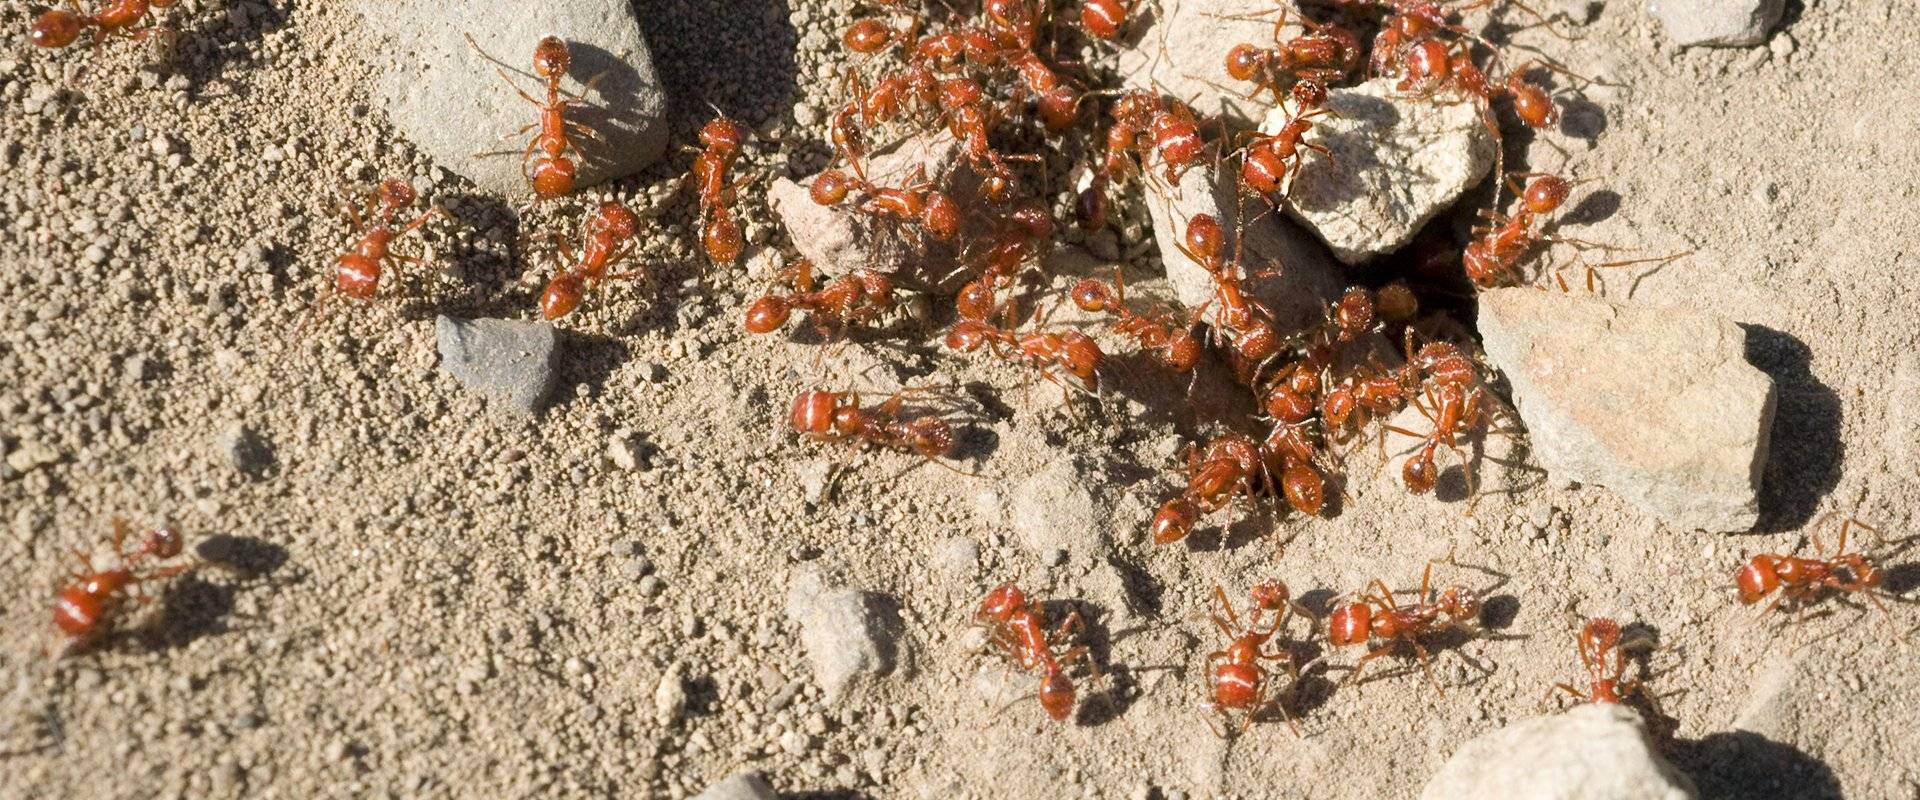 fire ants swarming